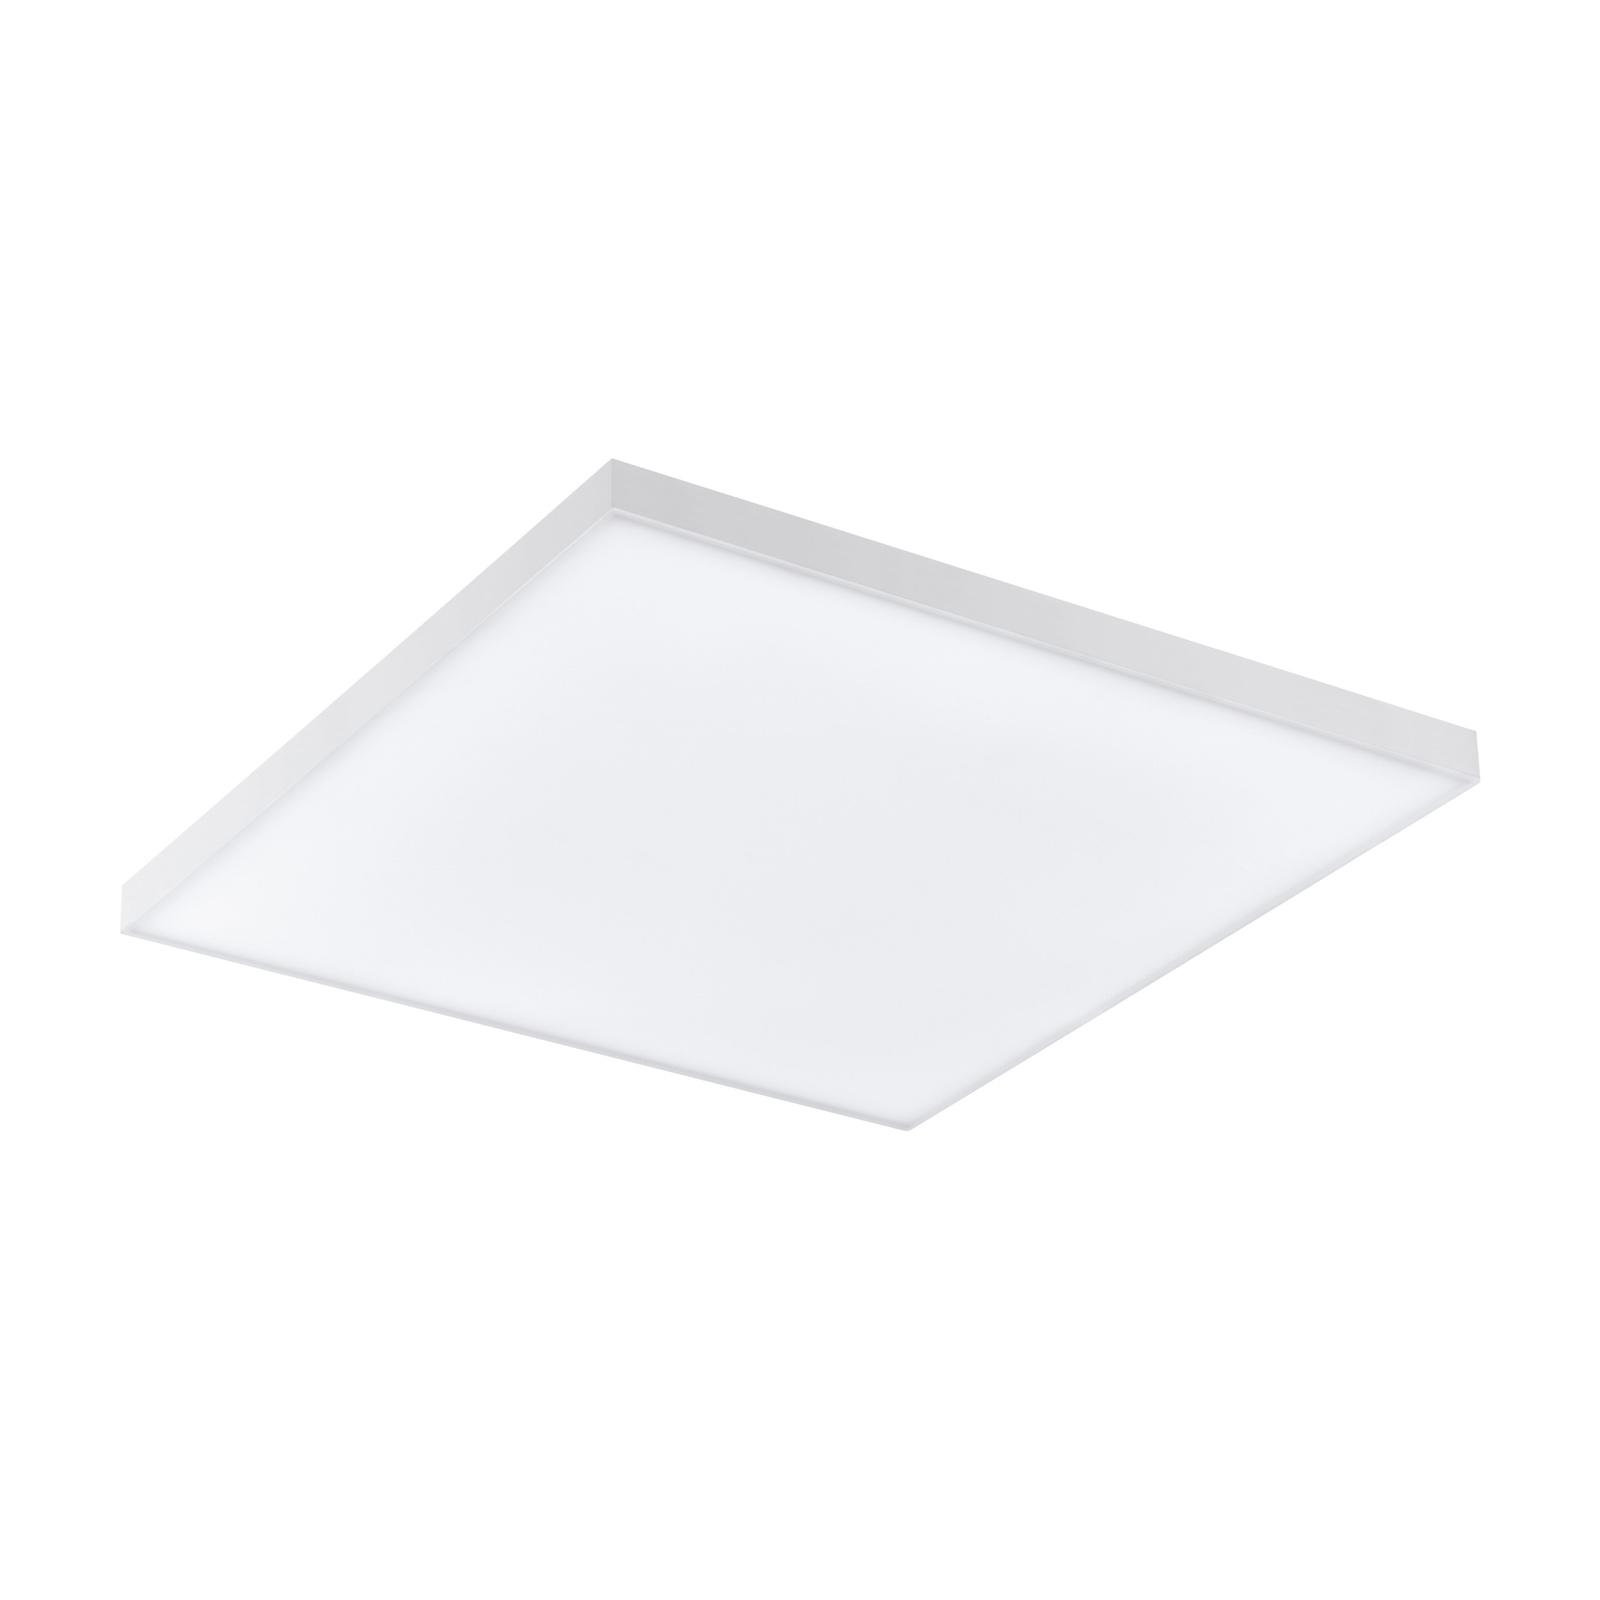 LED-taklampe Turcona, 30 x 30 cm